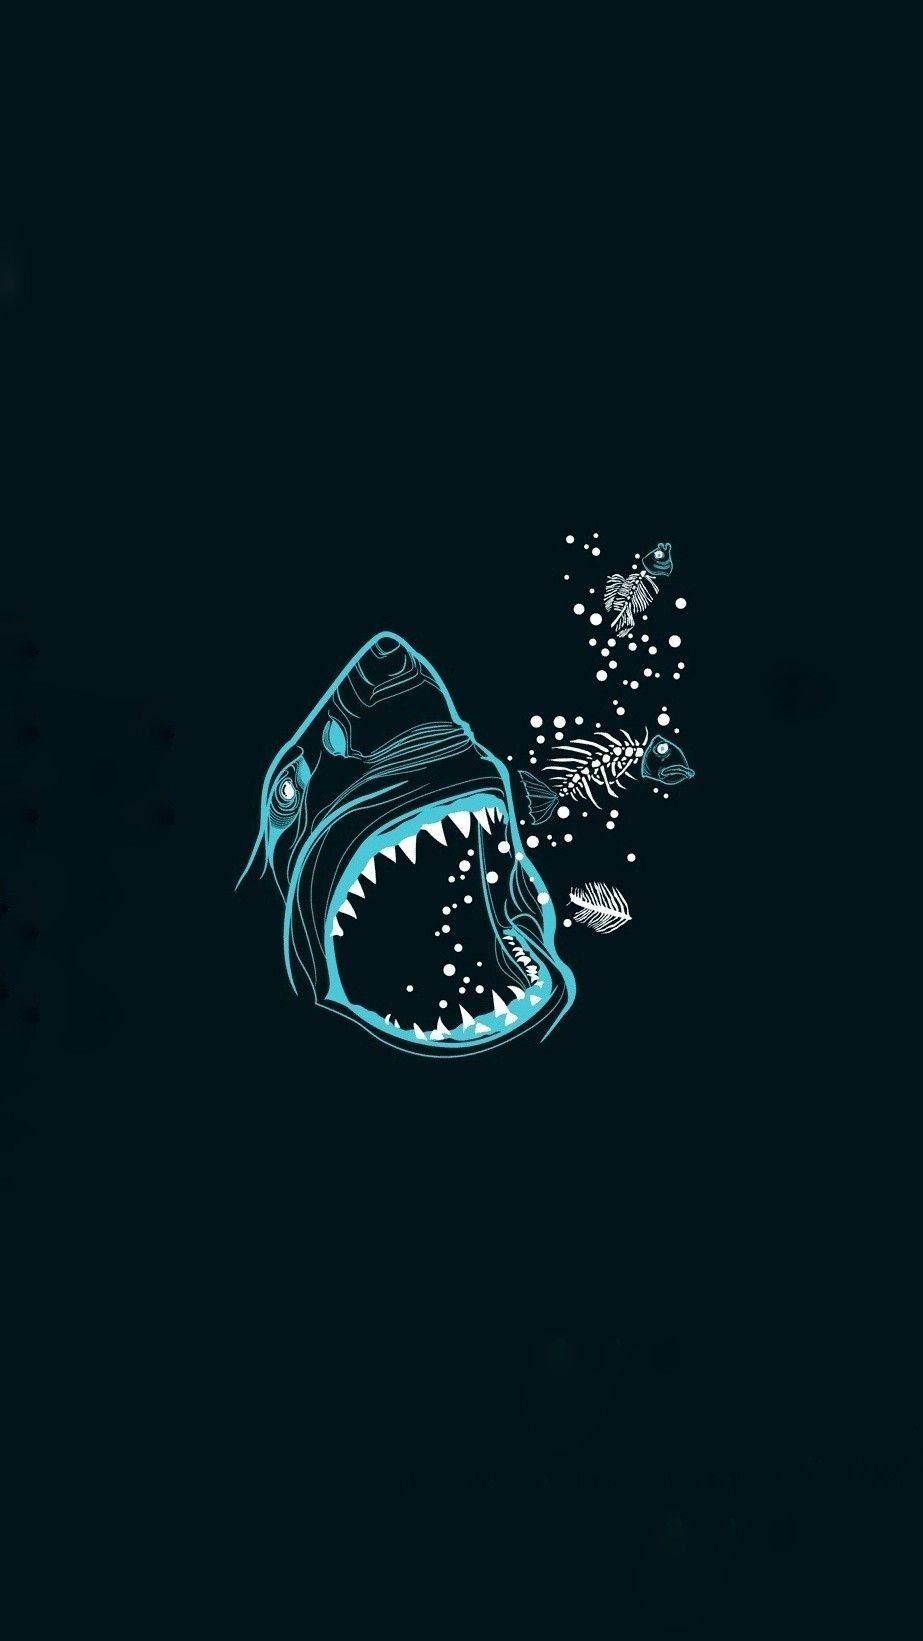 Fondo Tiburon En 2019 Fondos De Escritorio Minimalista